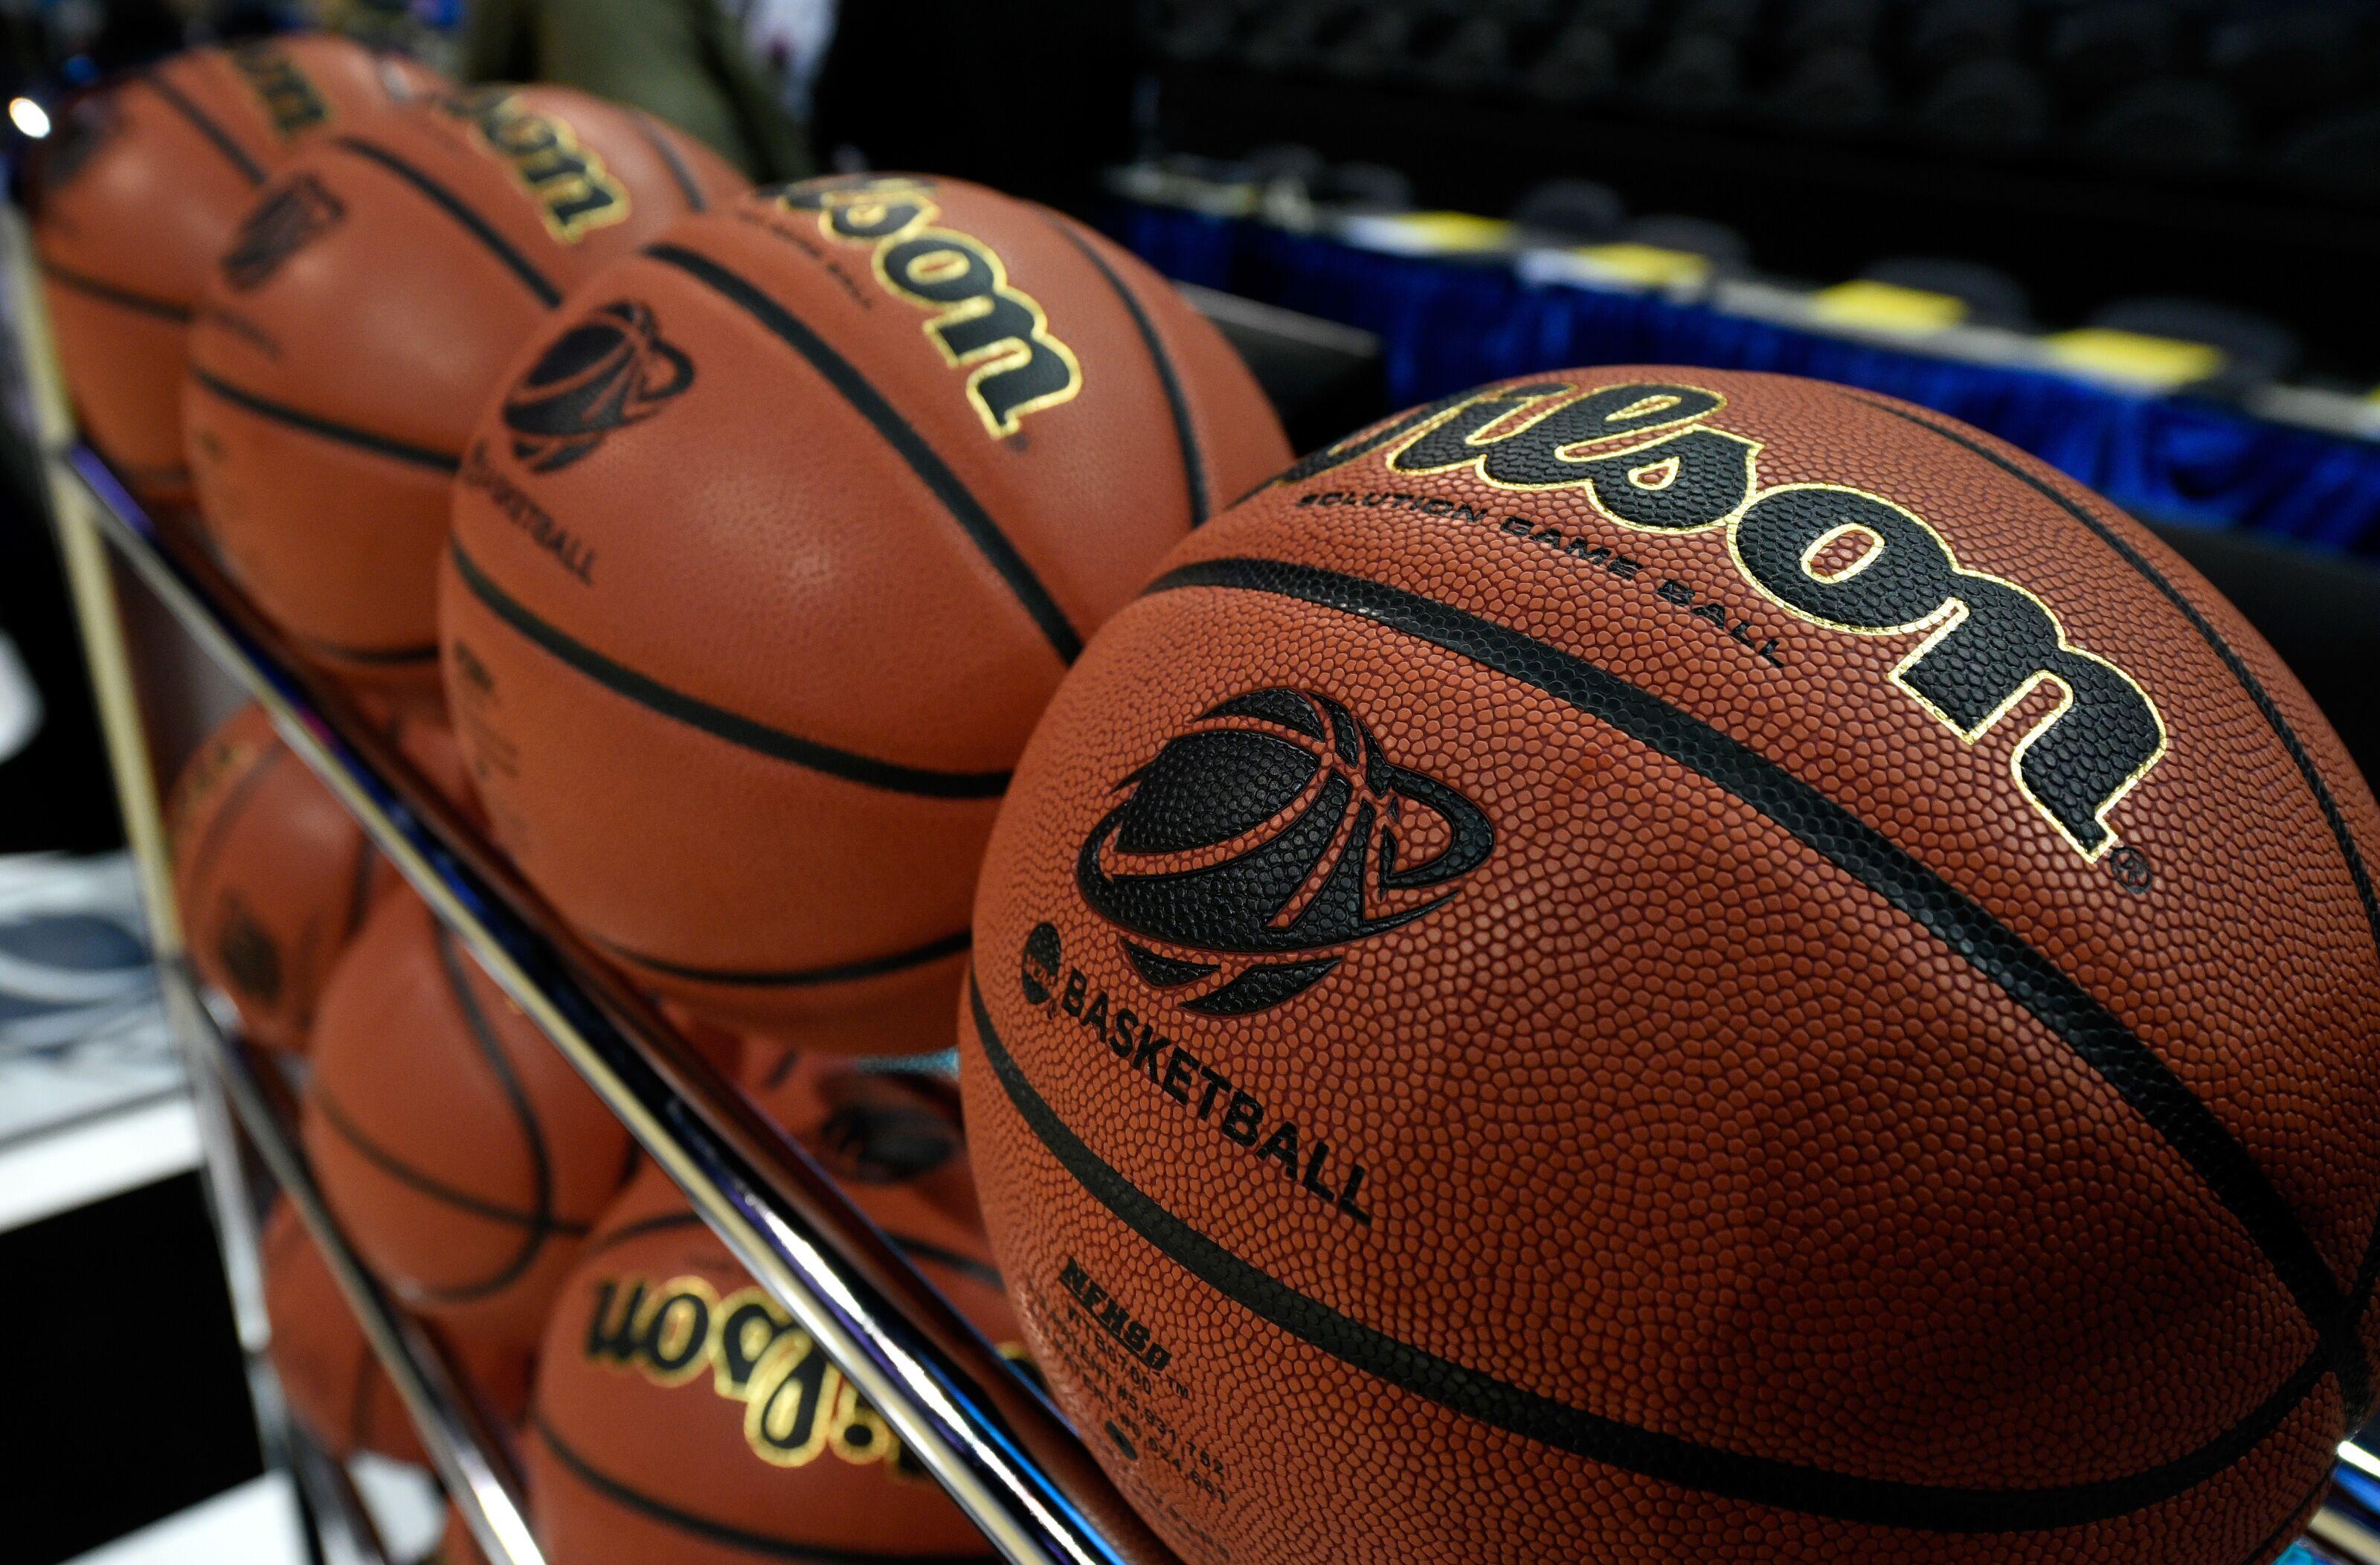 Georgia Tech Women's Basketball: Jackets see losing streak slide to three